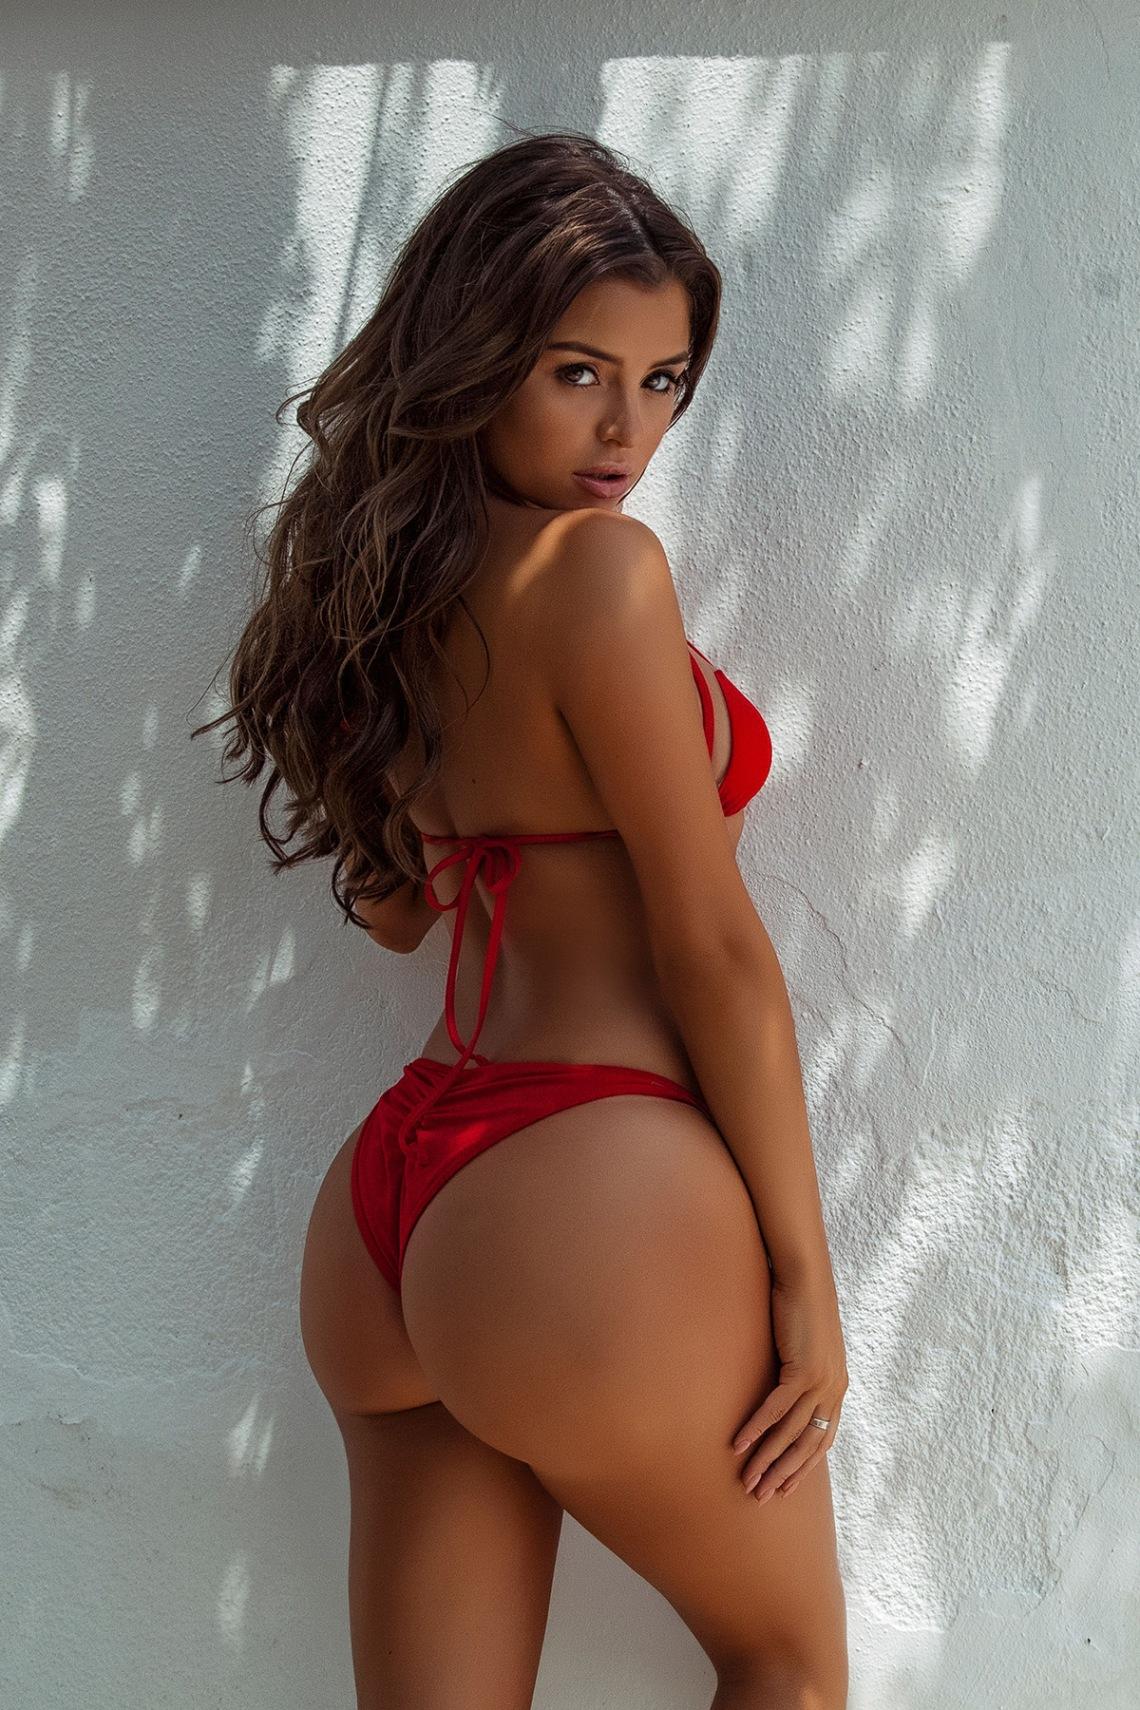 Demi_Rose_hot_cute_sexy_big_butt_babe_gorgeous body (4)